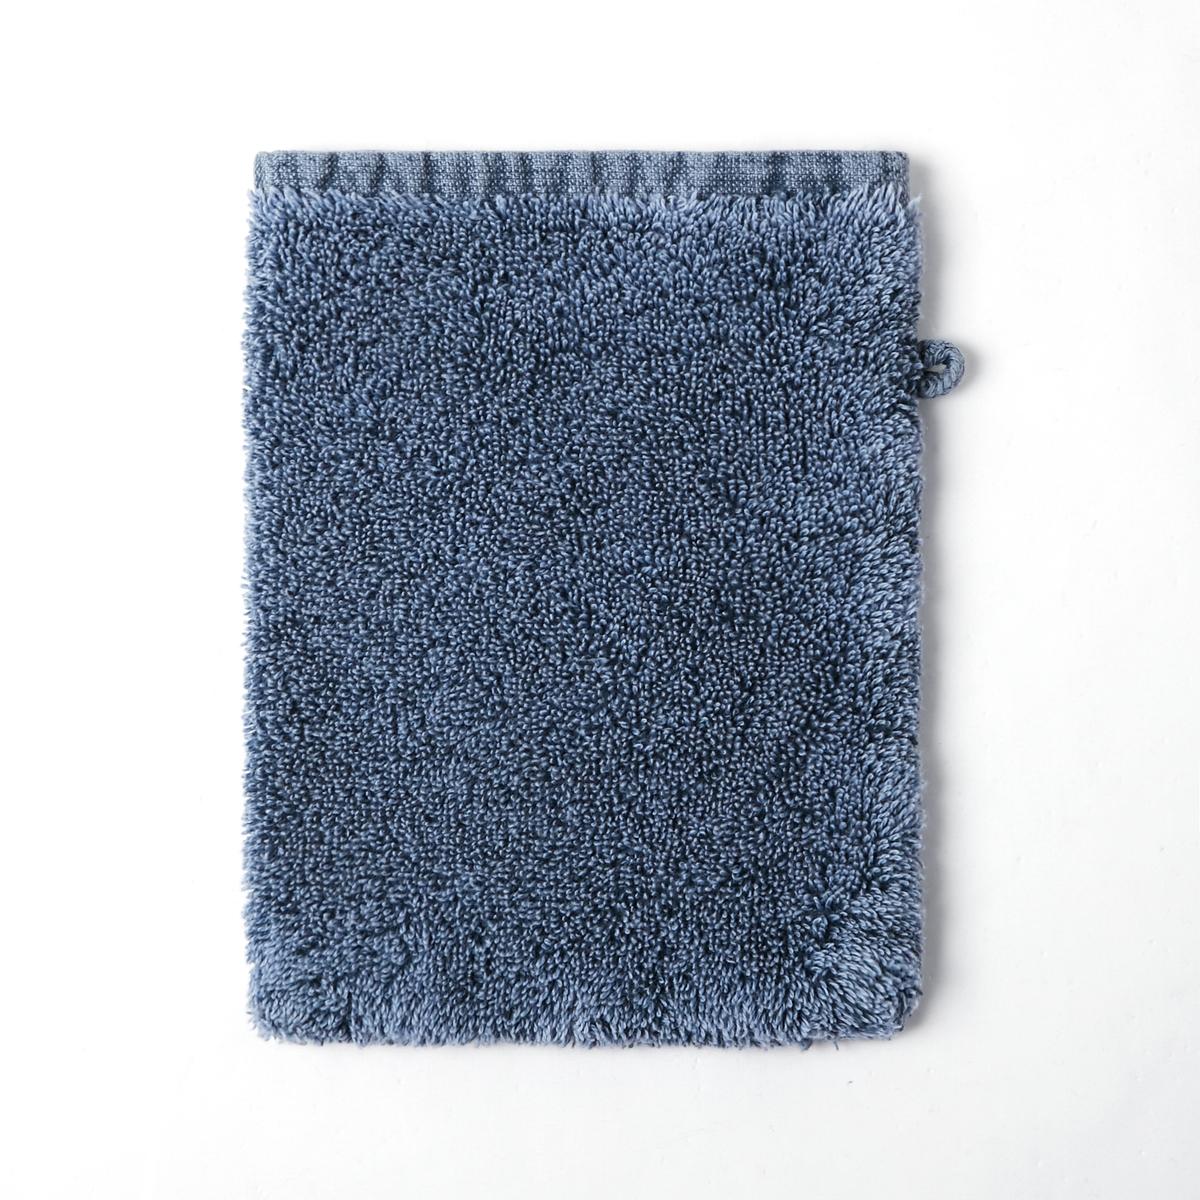 Рукавица банная ANJO, 100% хлопок